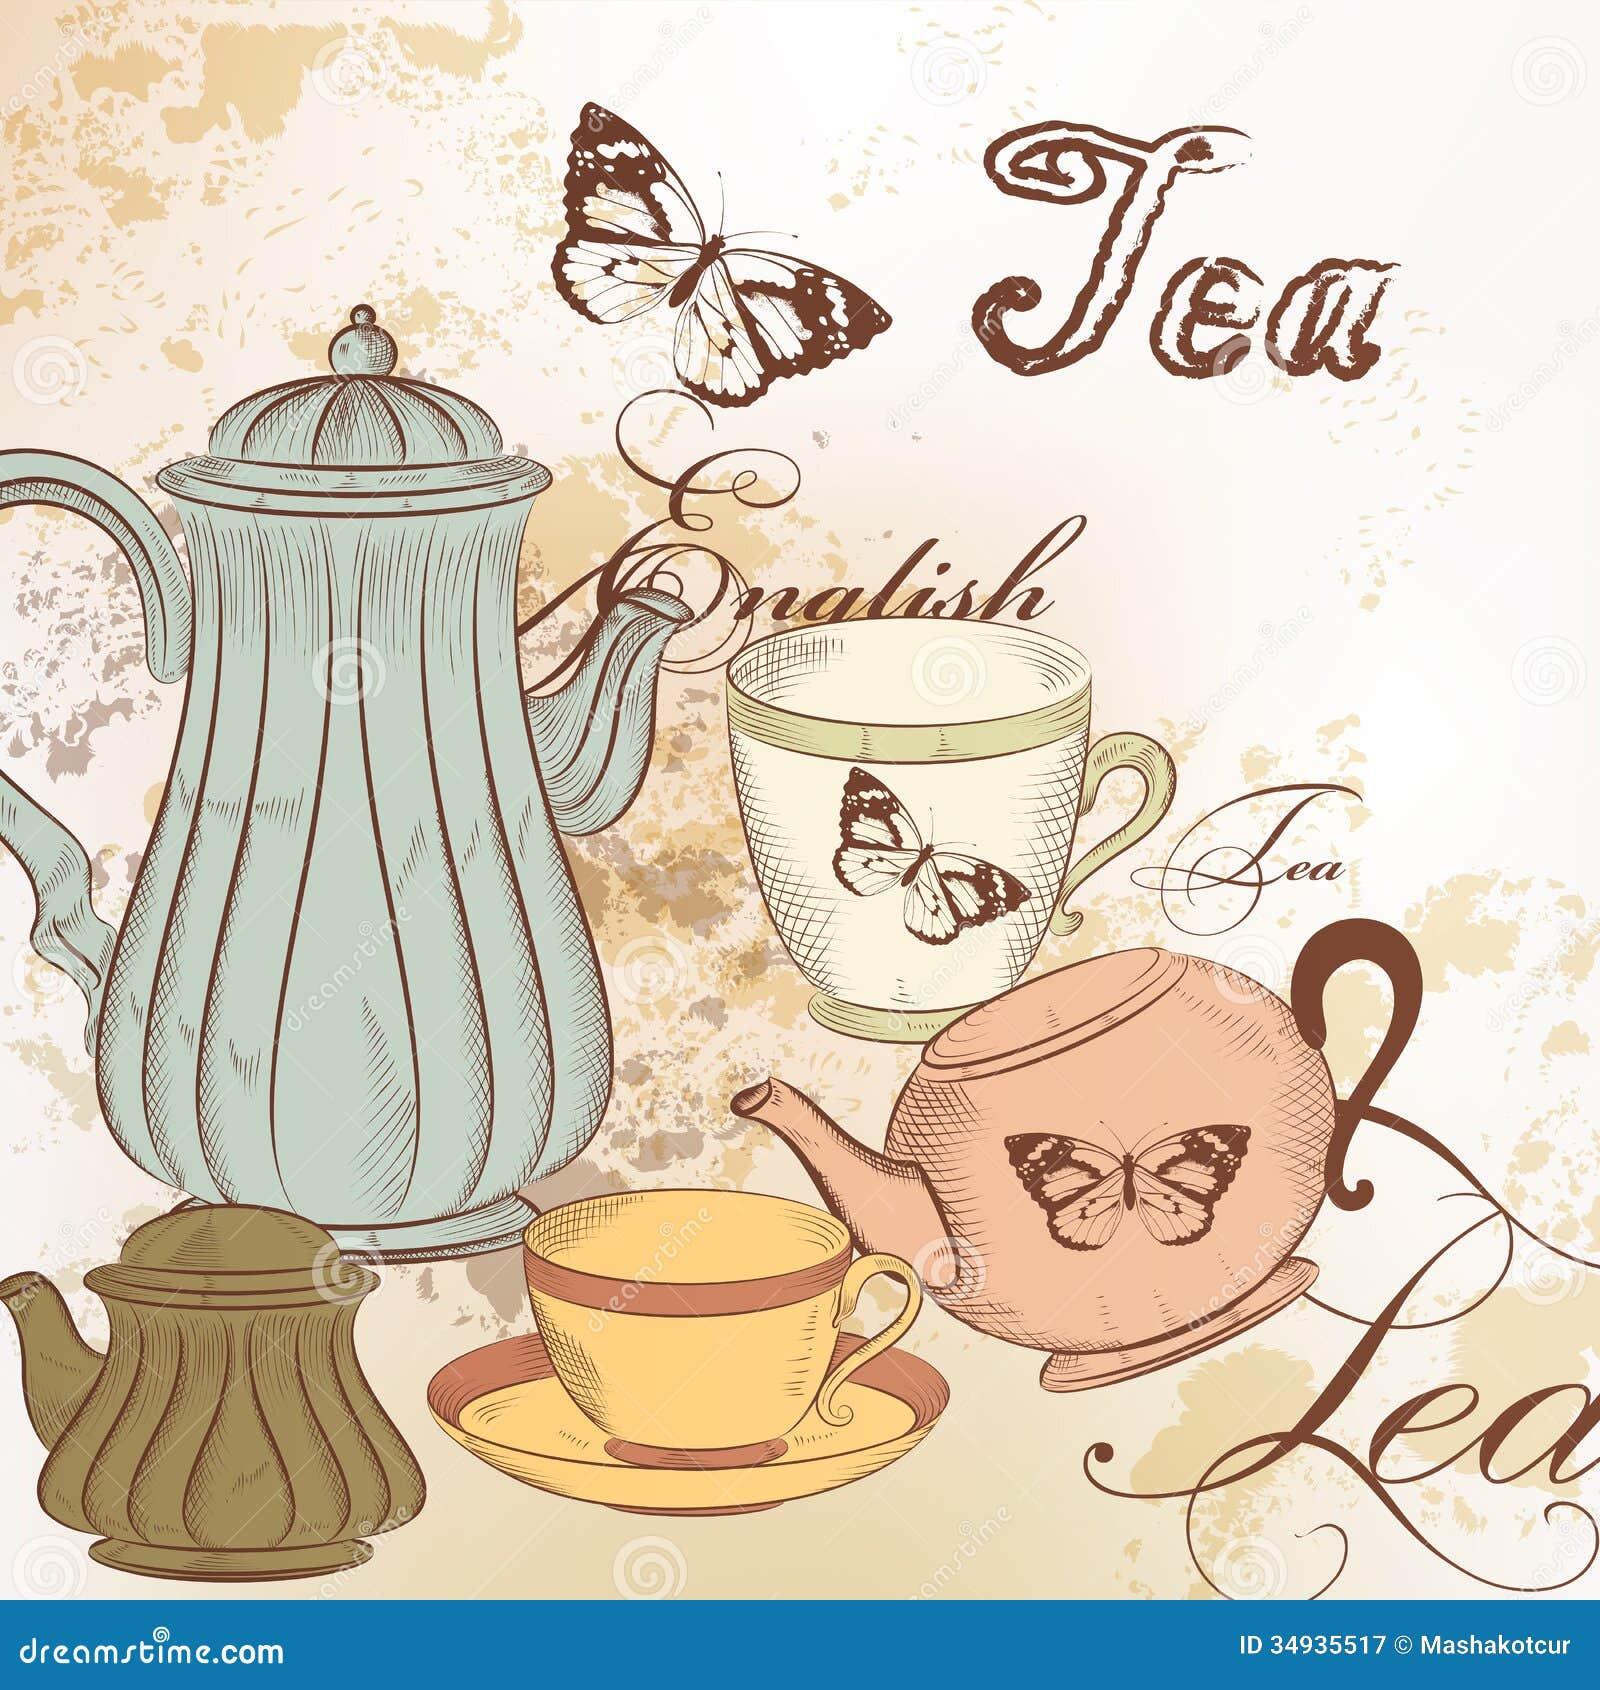 vintage tea cup wallpaper - photo #39